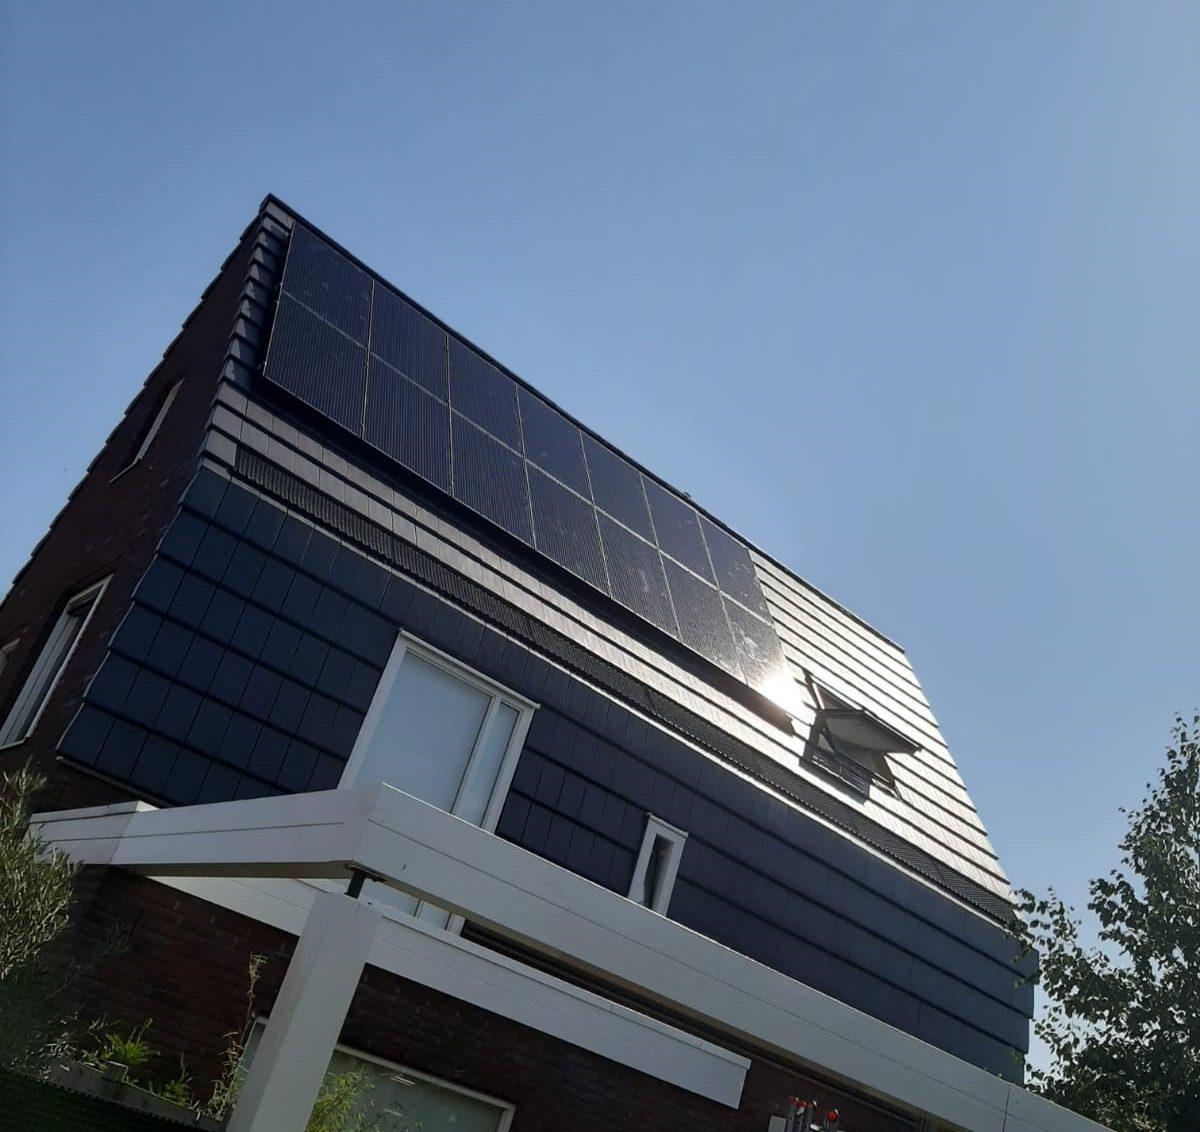 Talesun 315 Woningen2 E1594814258916, uw zonnepanelen Specialist